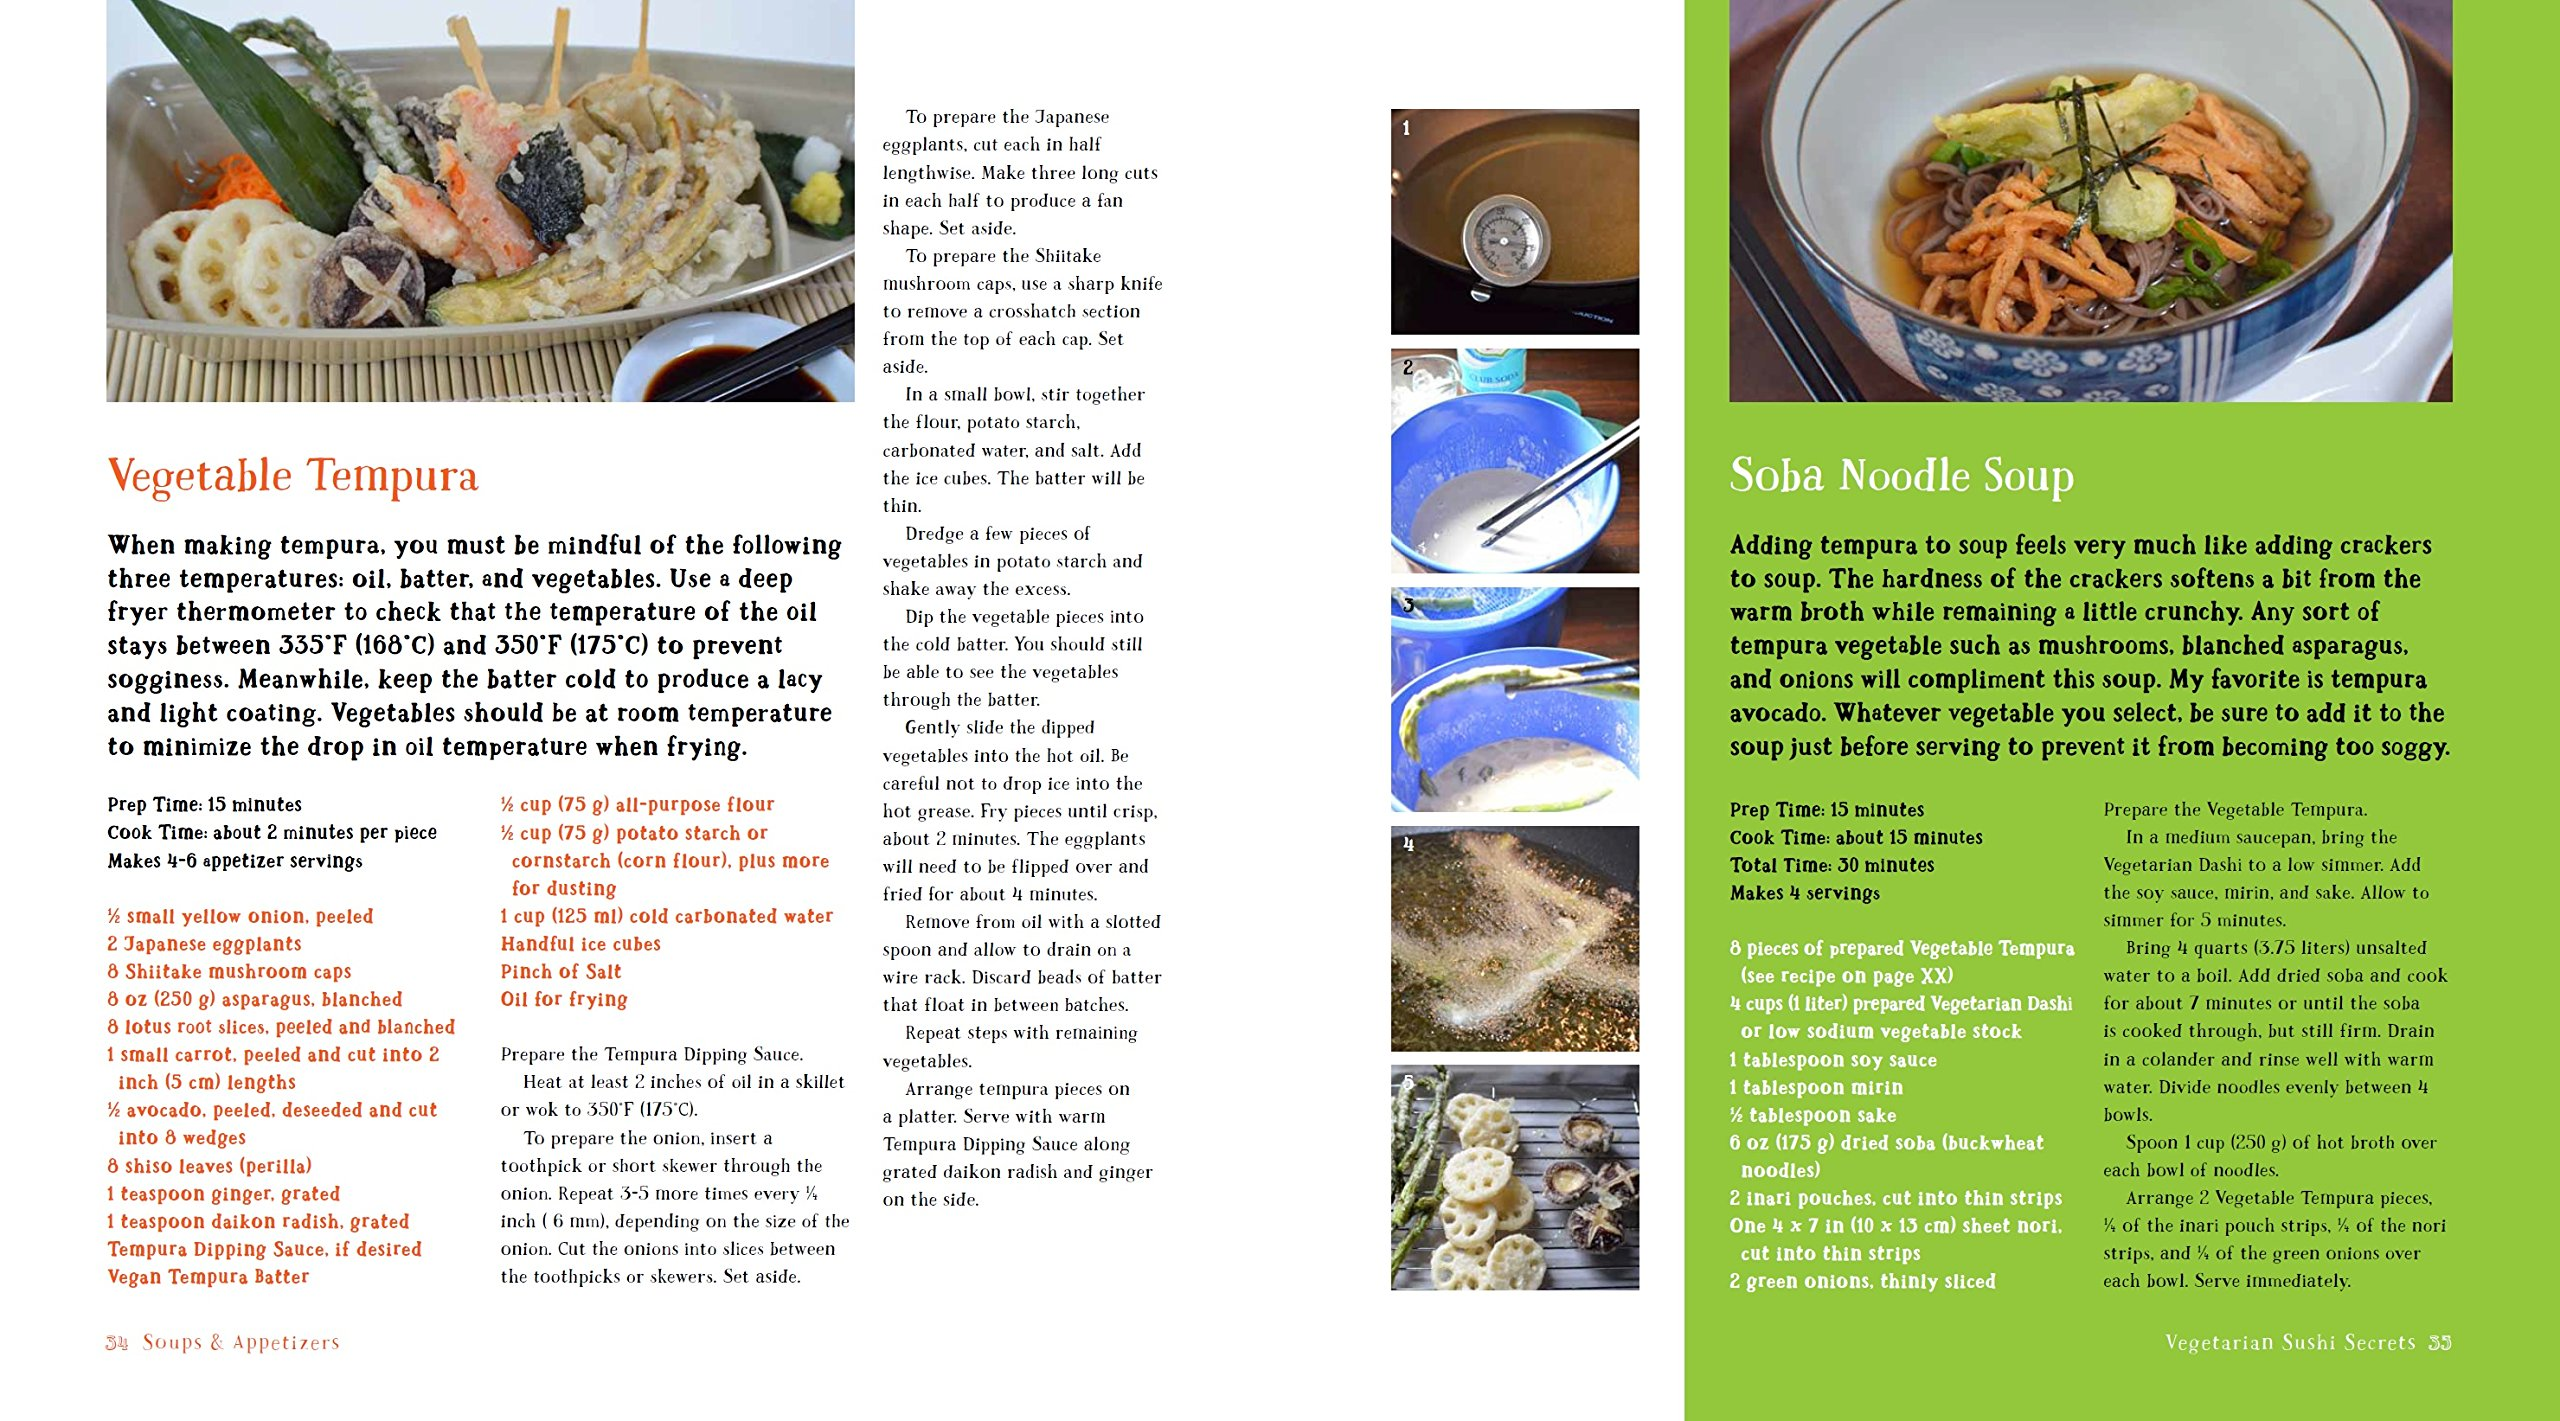 Vegetarian Sushi Secrets: 101 Healthy and Delicious Recipes: Marisa ...